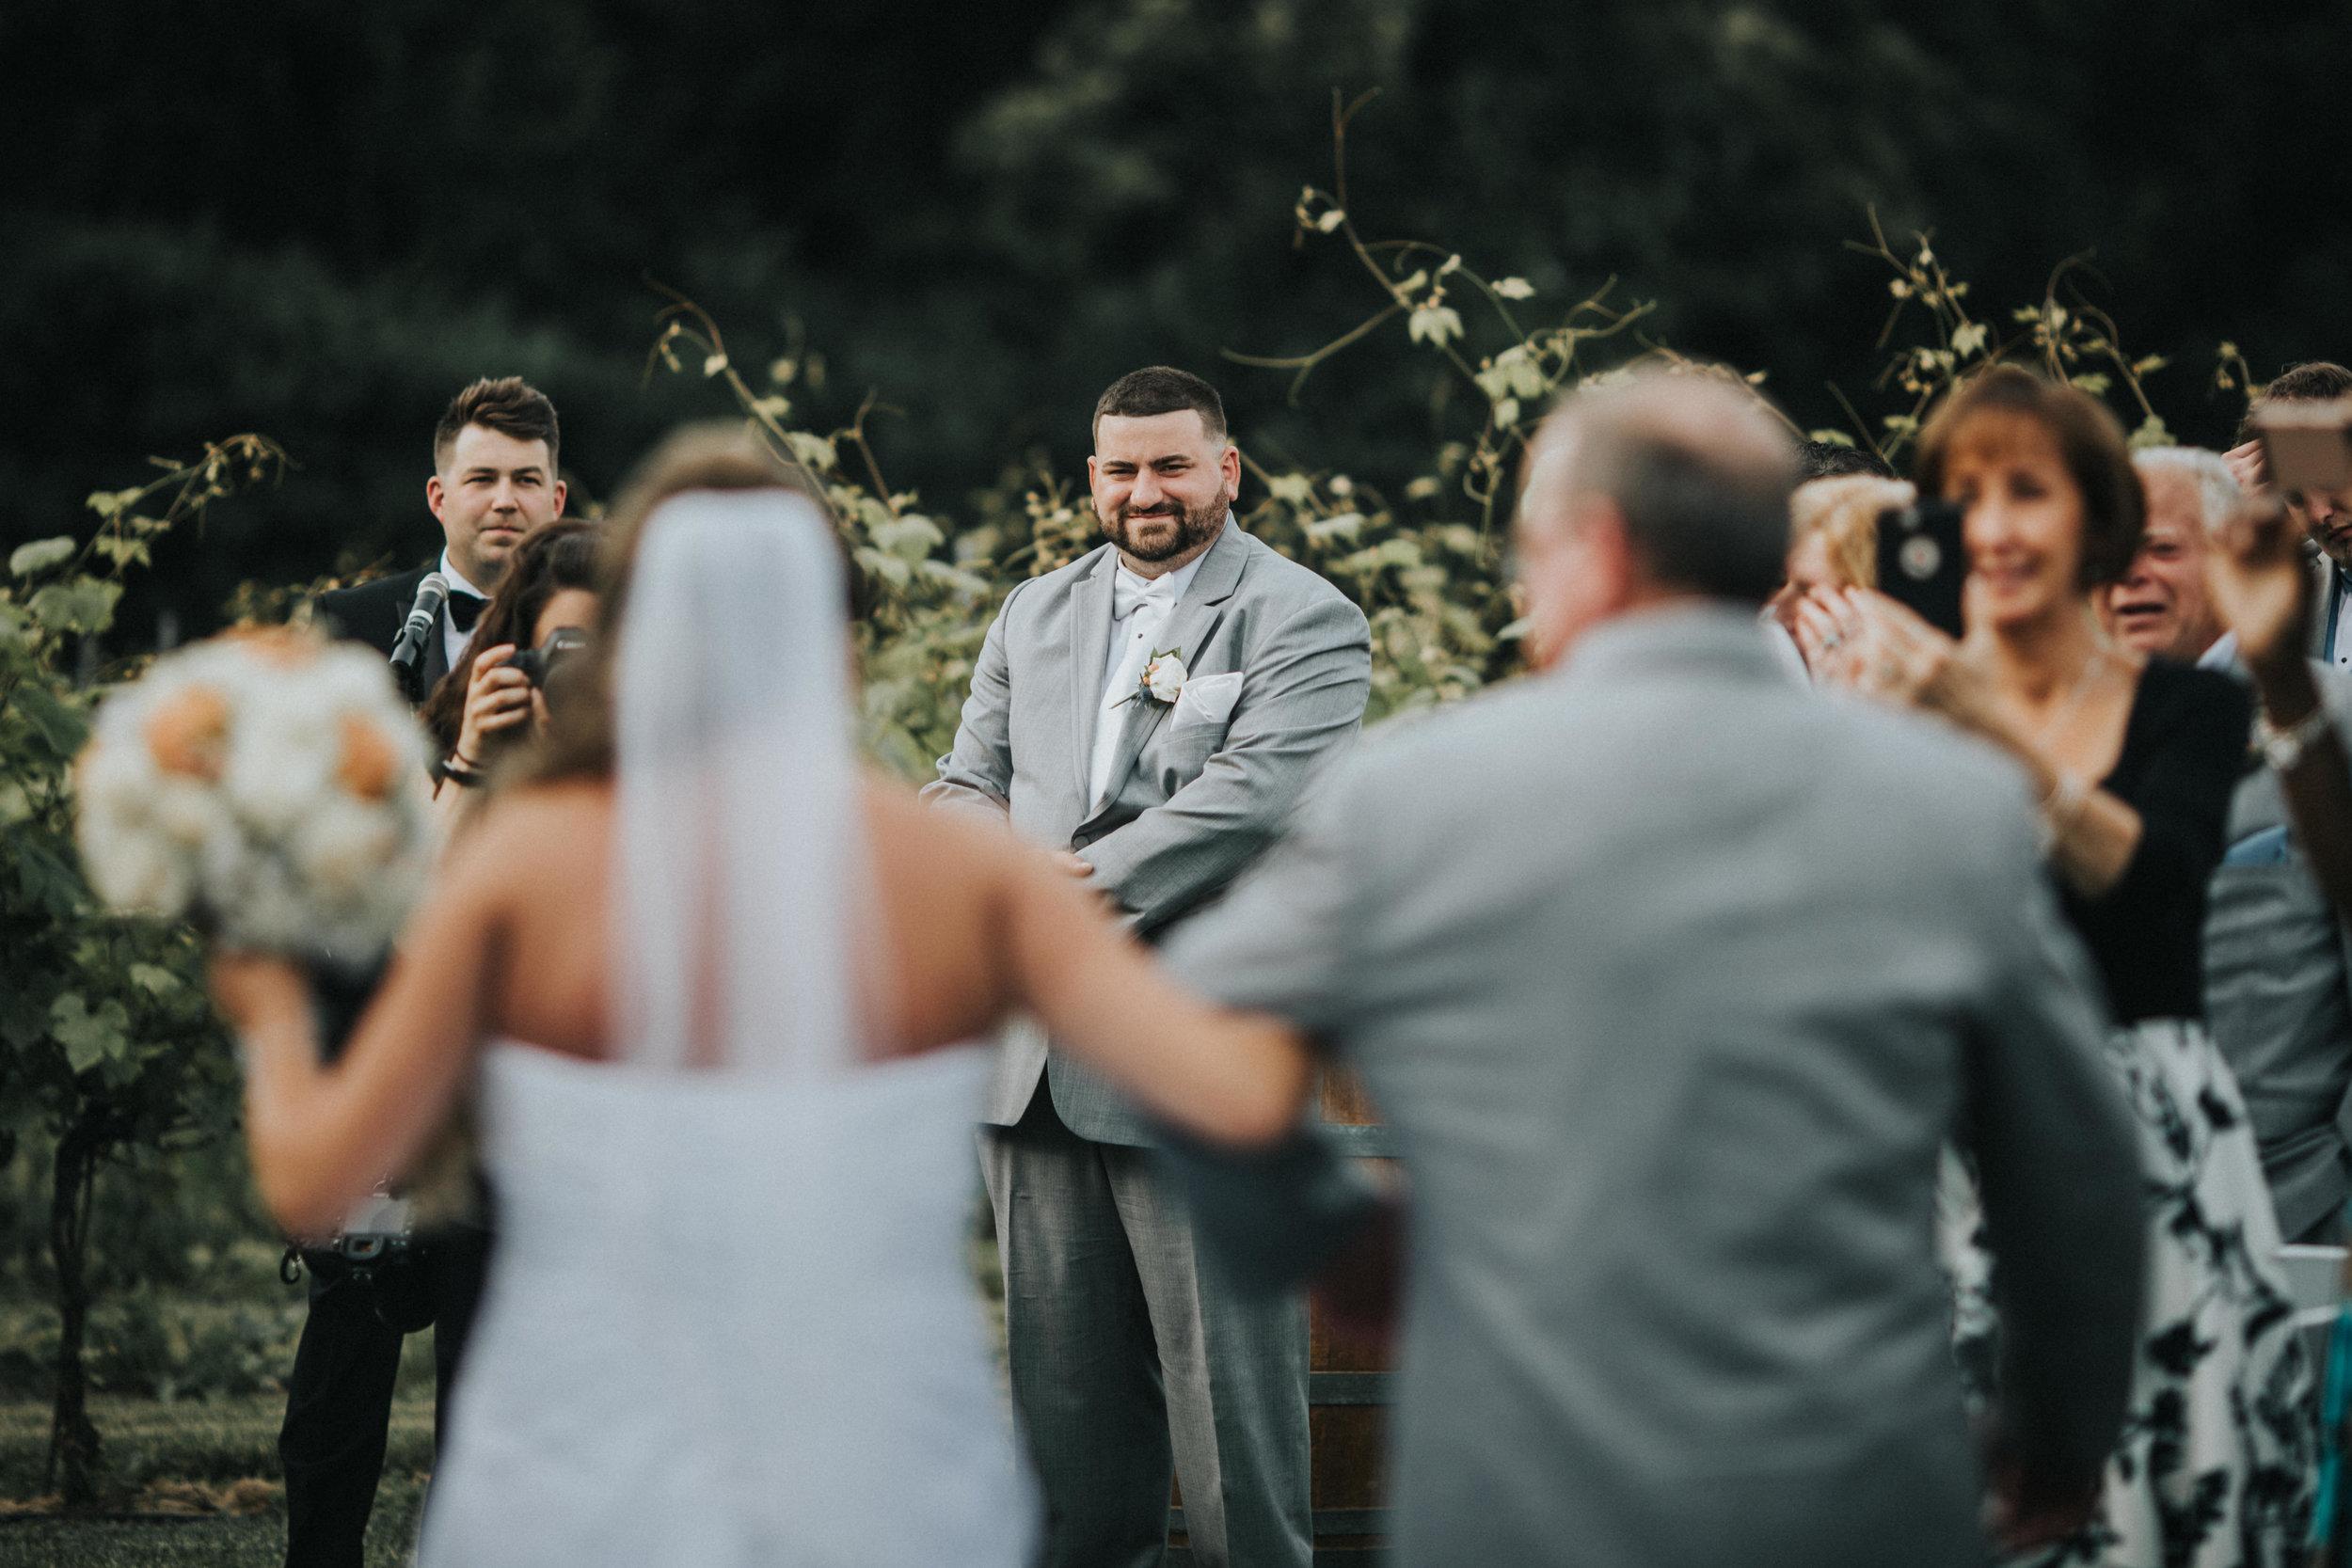 New-Jersey-Wedding-Photographer-JennaLynnPhotography-ValenzanoWinery-Ceremony-86.jpg